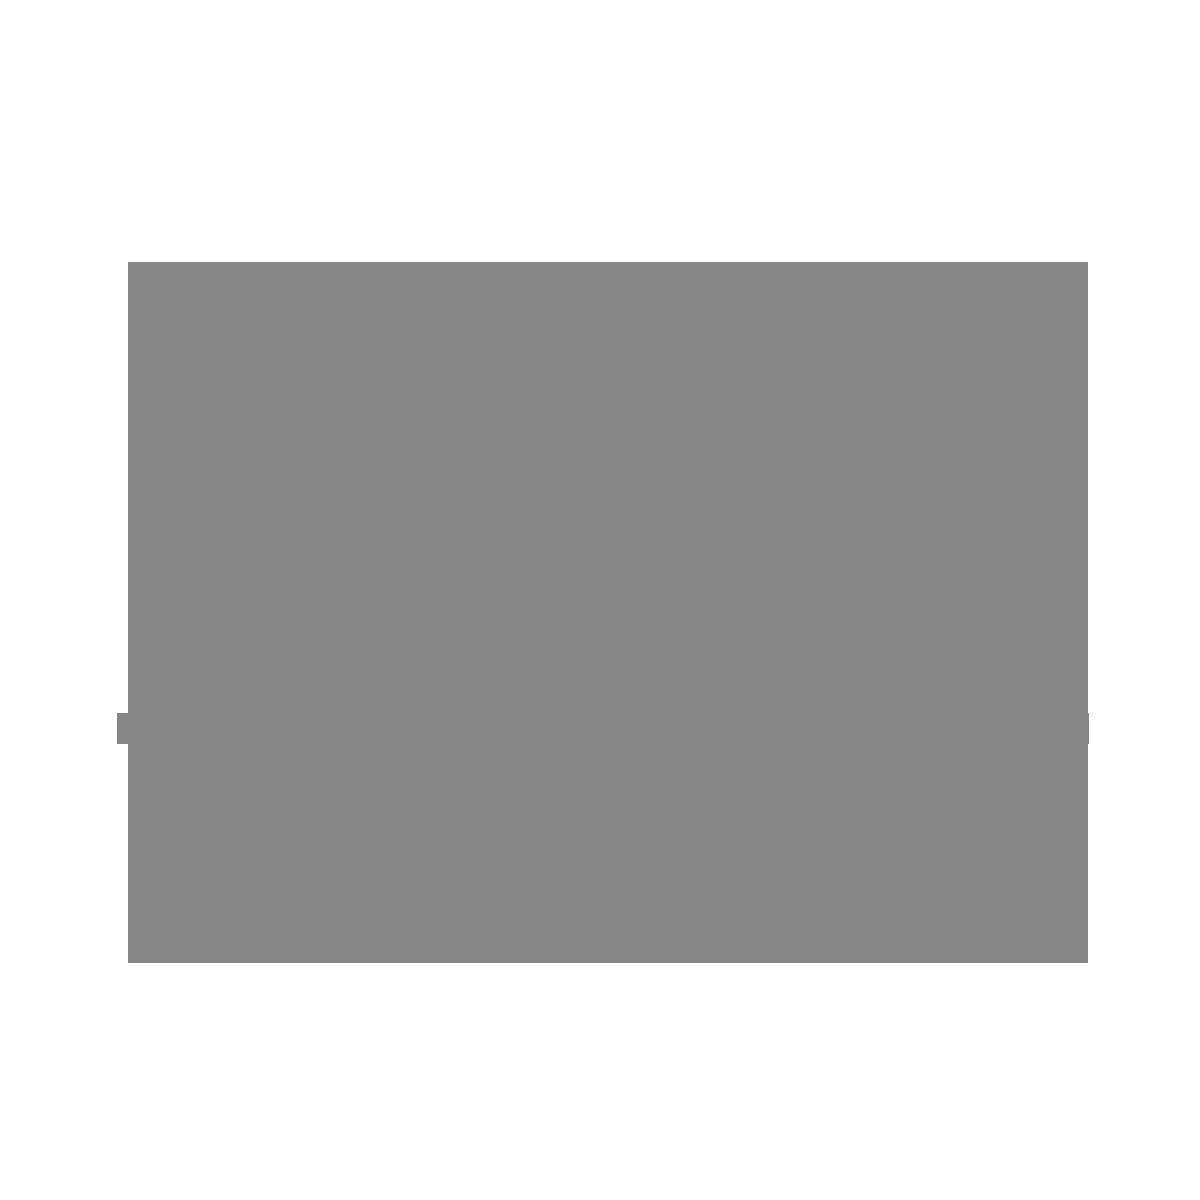 Office / VoIP / Call Center